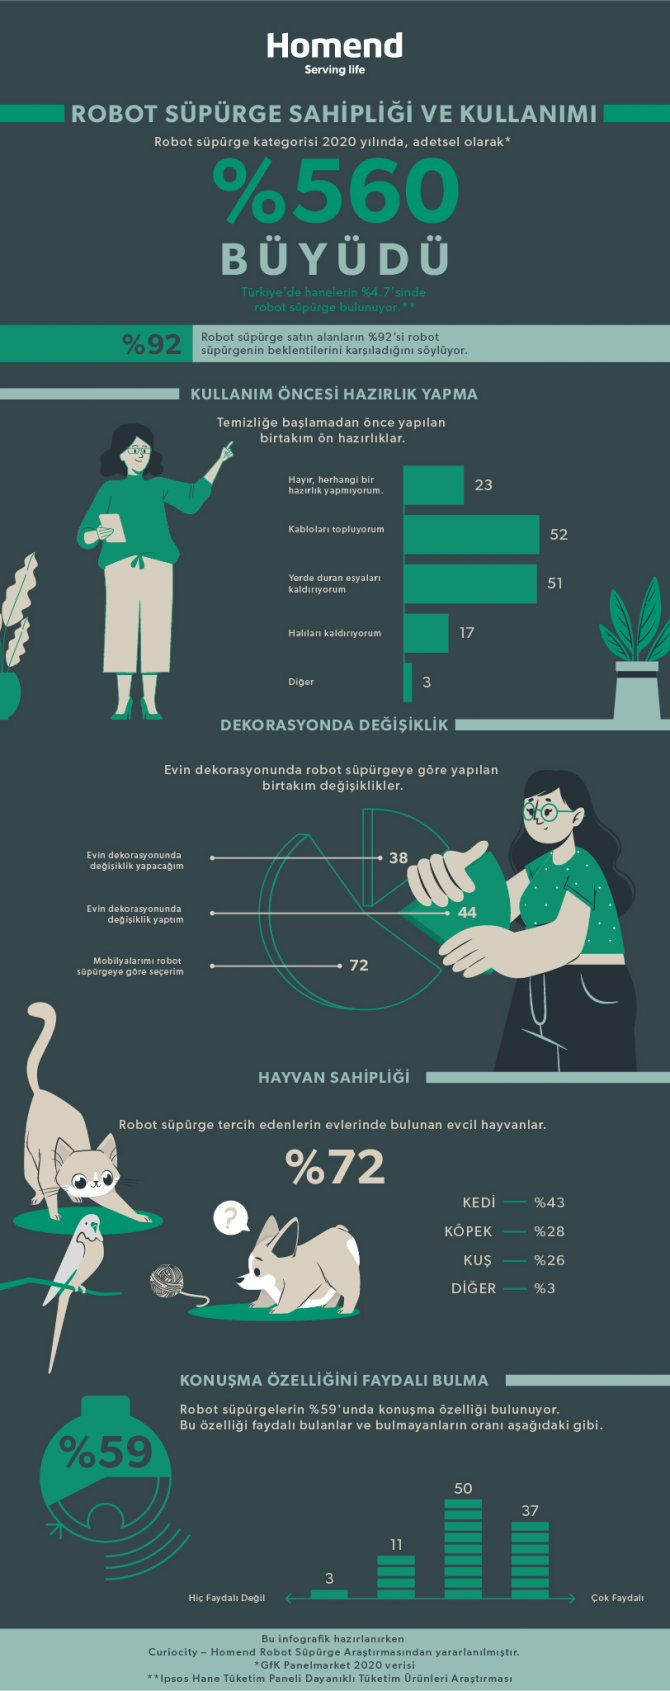 1620720575_homend_infografik-001.jpg